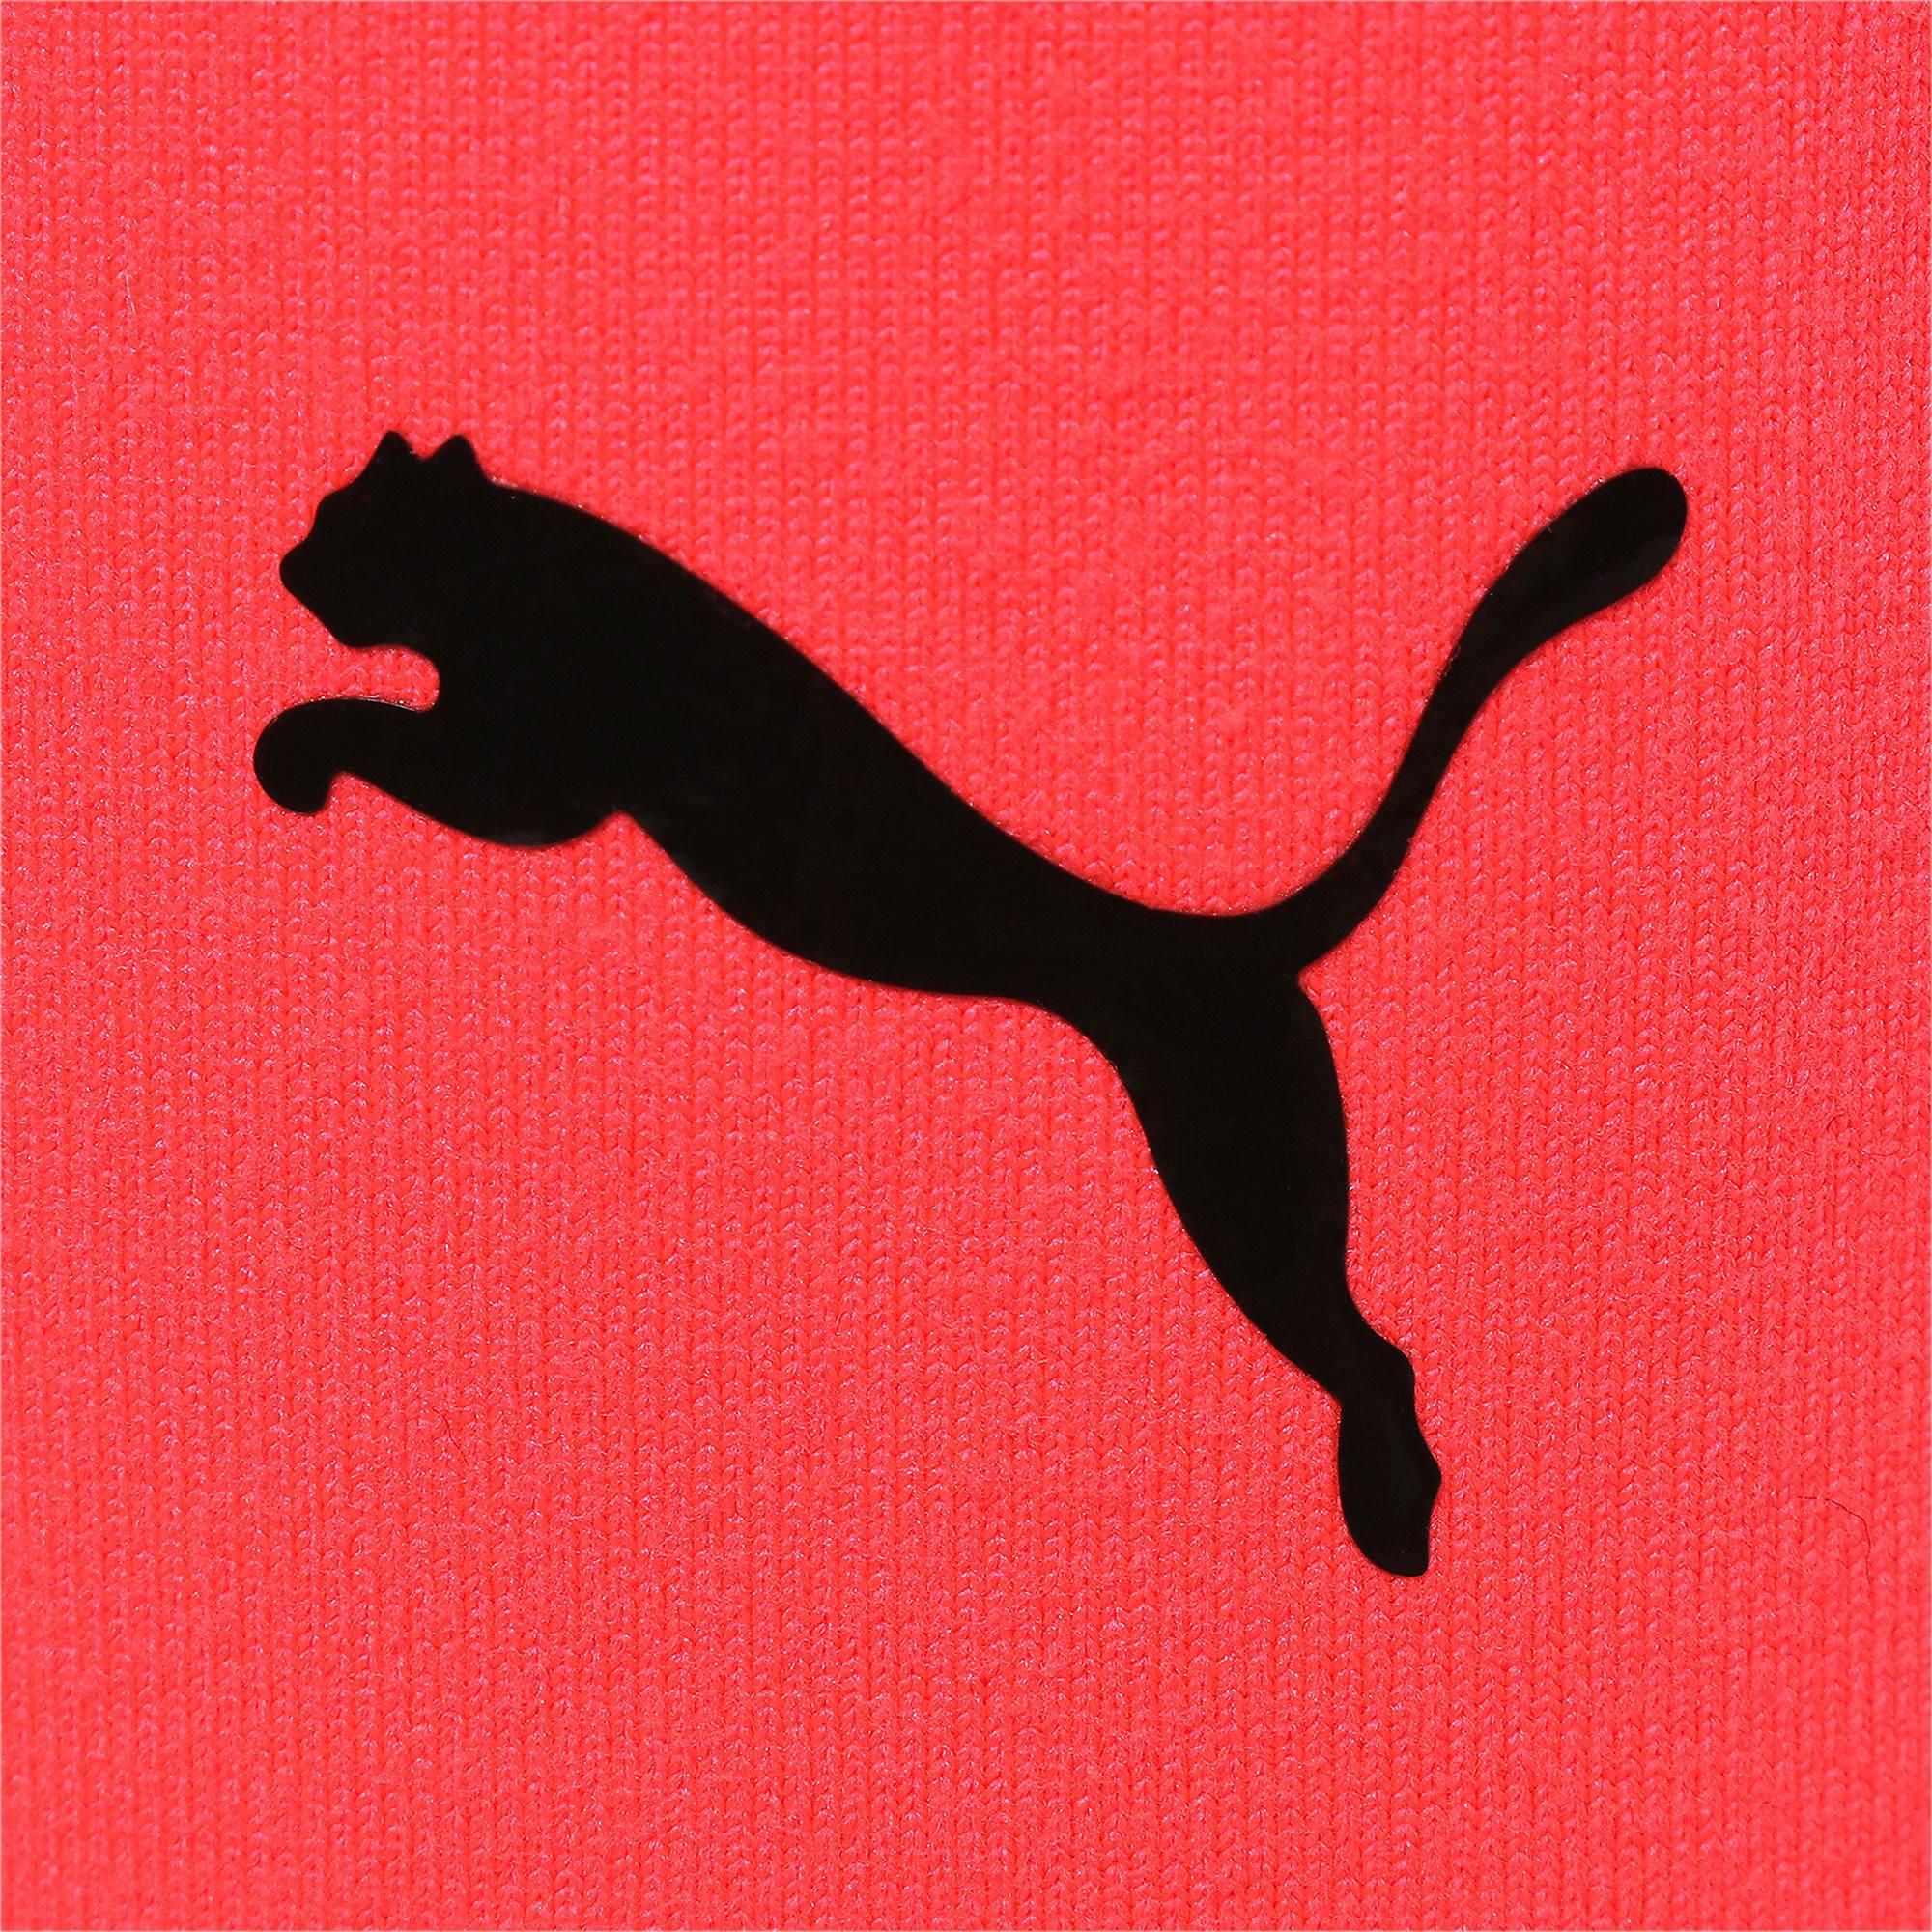 Thumbnail 7 of BE BOLD ウィメンズ トレーニング ロゴ 7/8タイツ, Puma Black-Pink Alert, medium-JPN